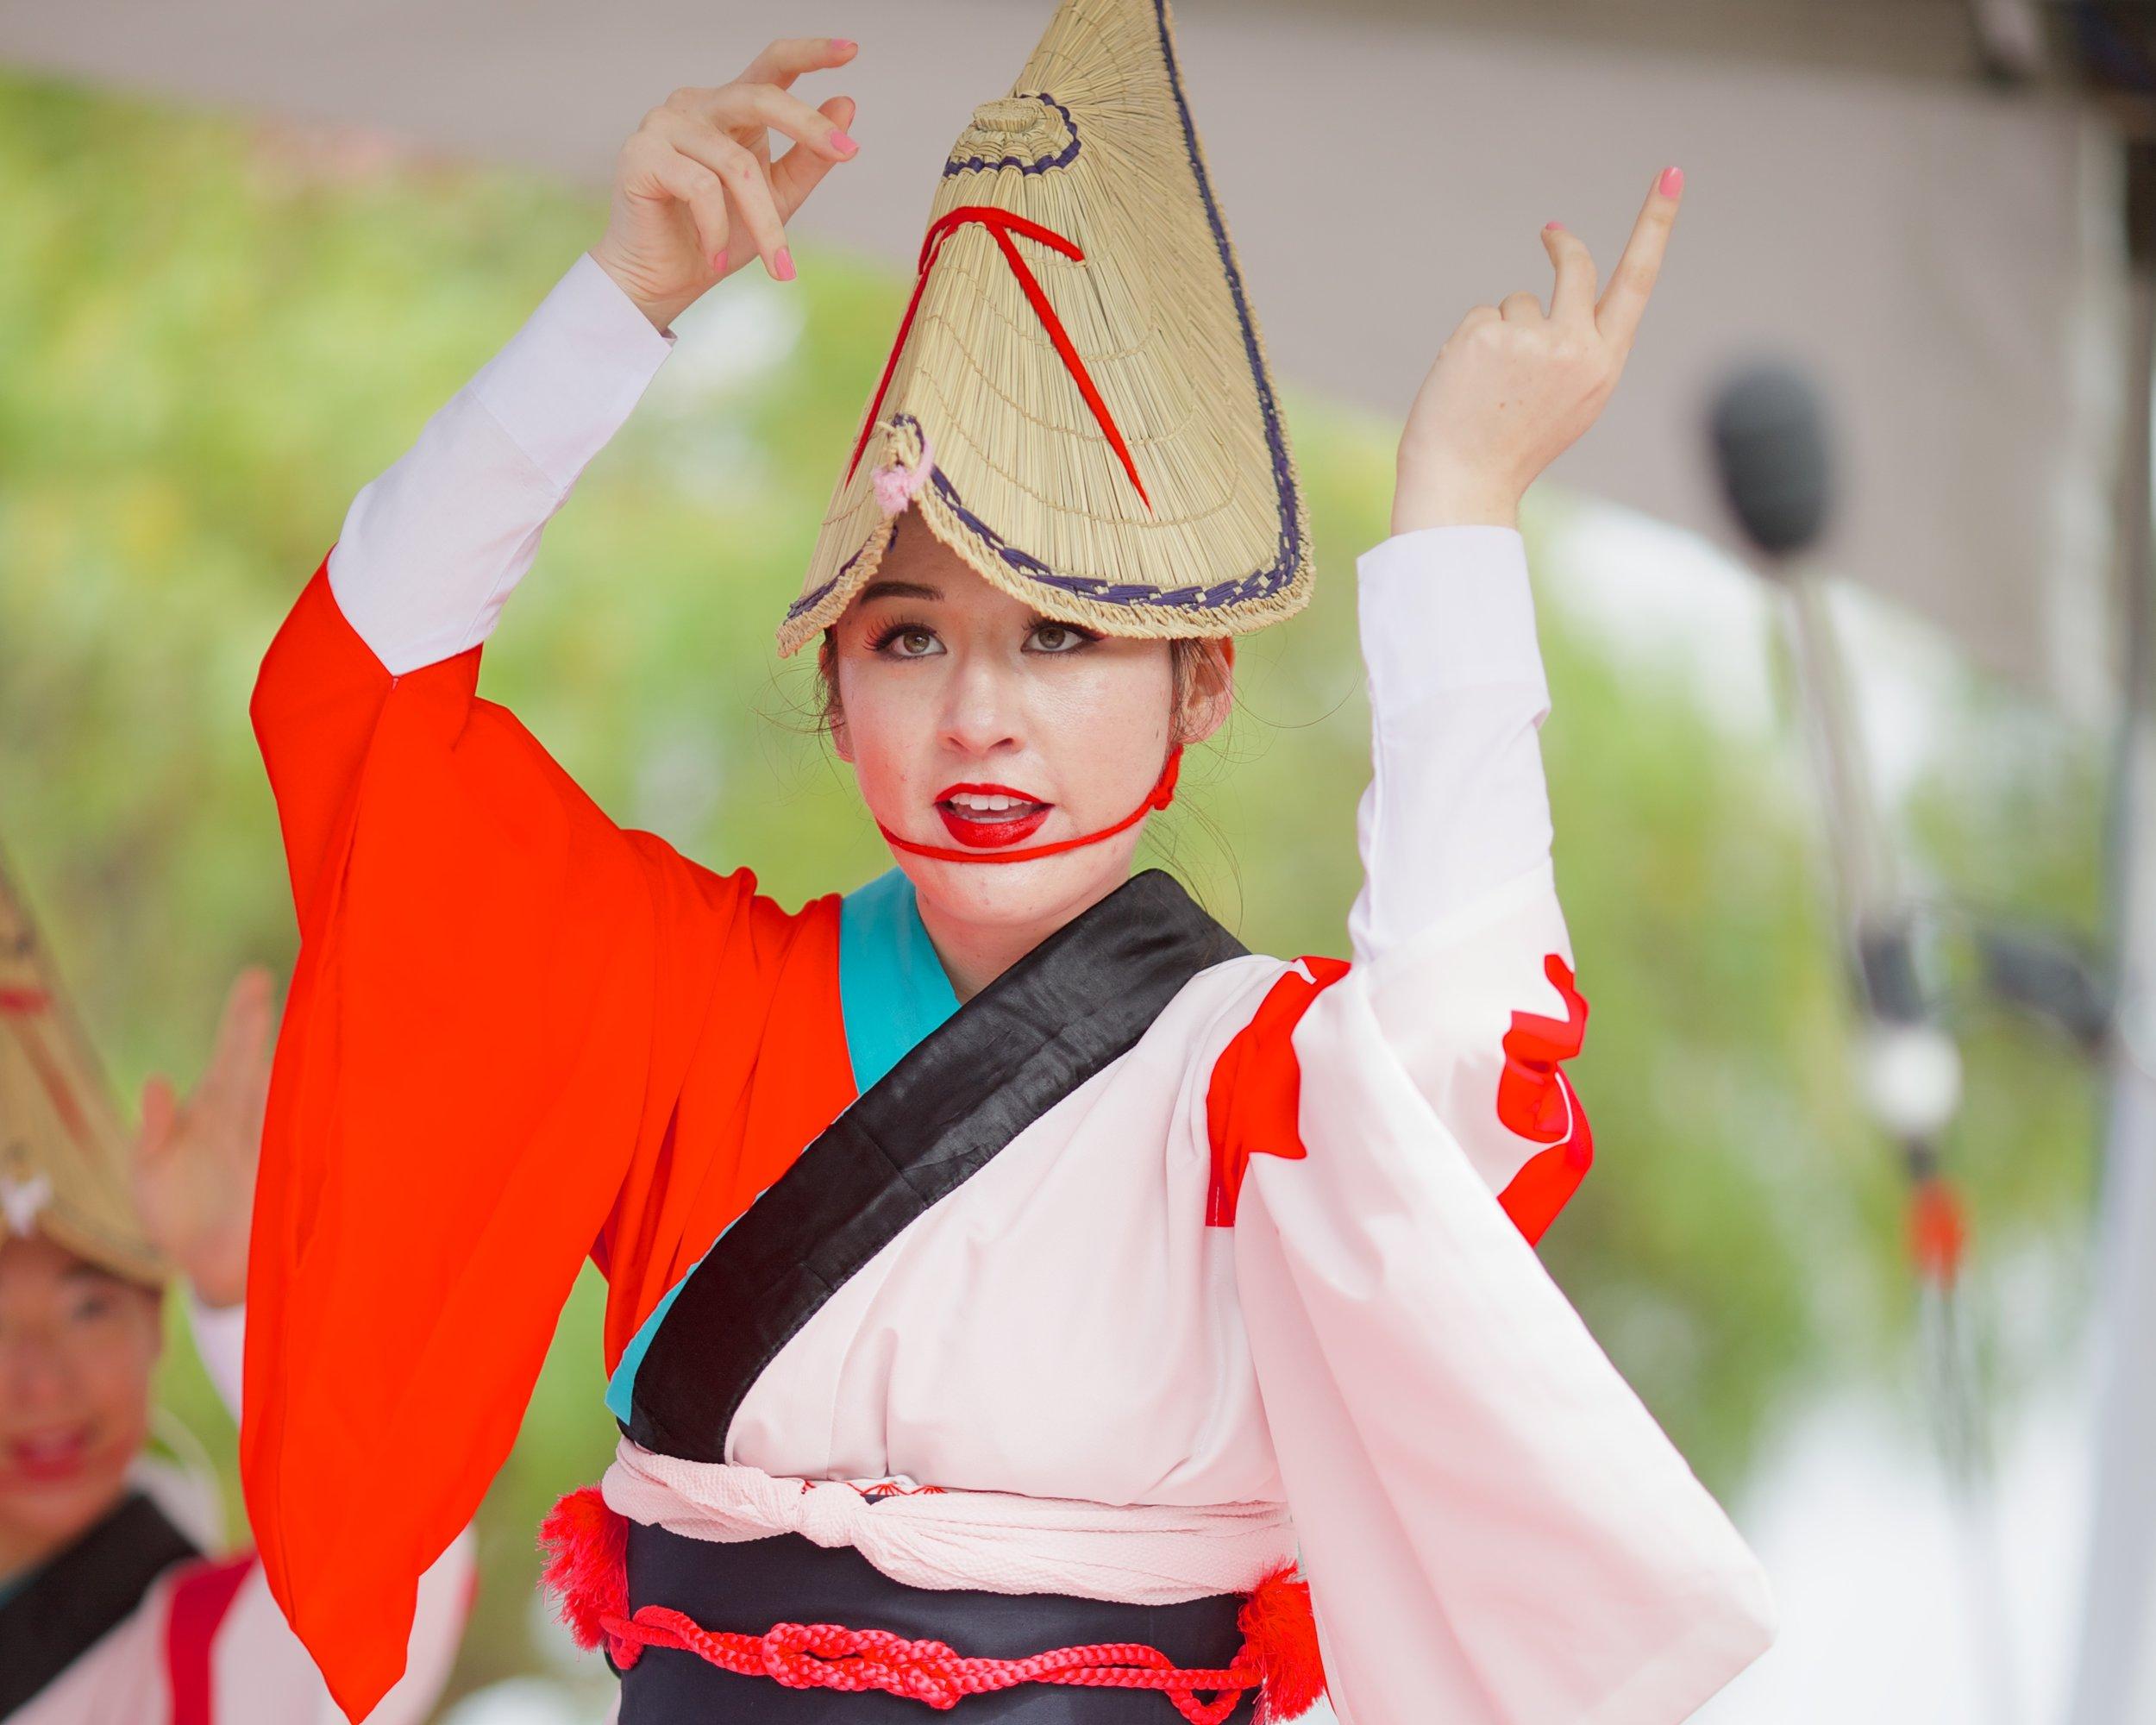 sakura-ren---japanese-cultural-fair-of-santa-cruz-2015_19570445136_o.jpg